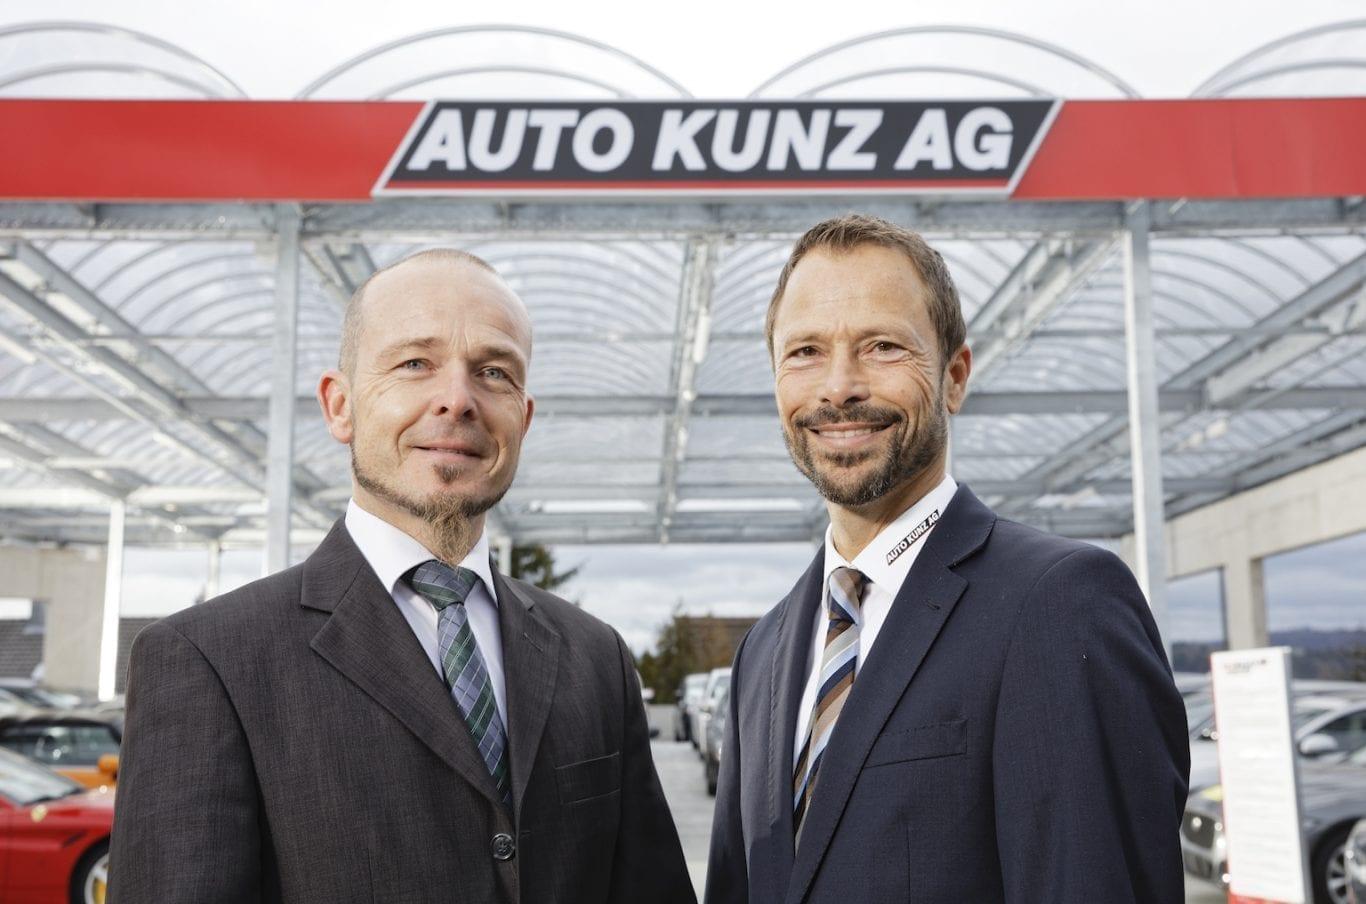 Garage Auto Kunz heute - Auto Kunz AG 7